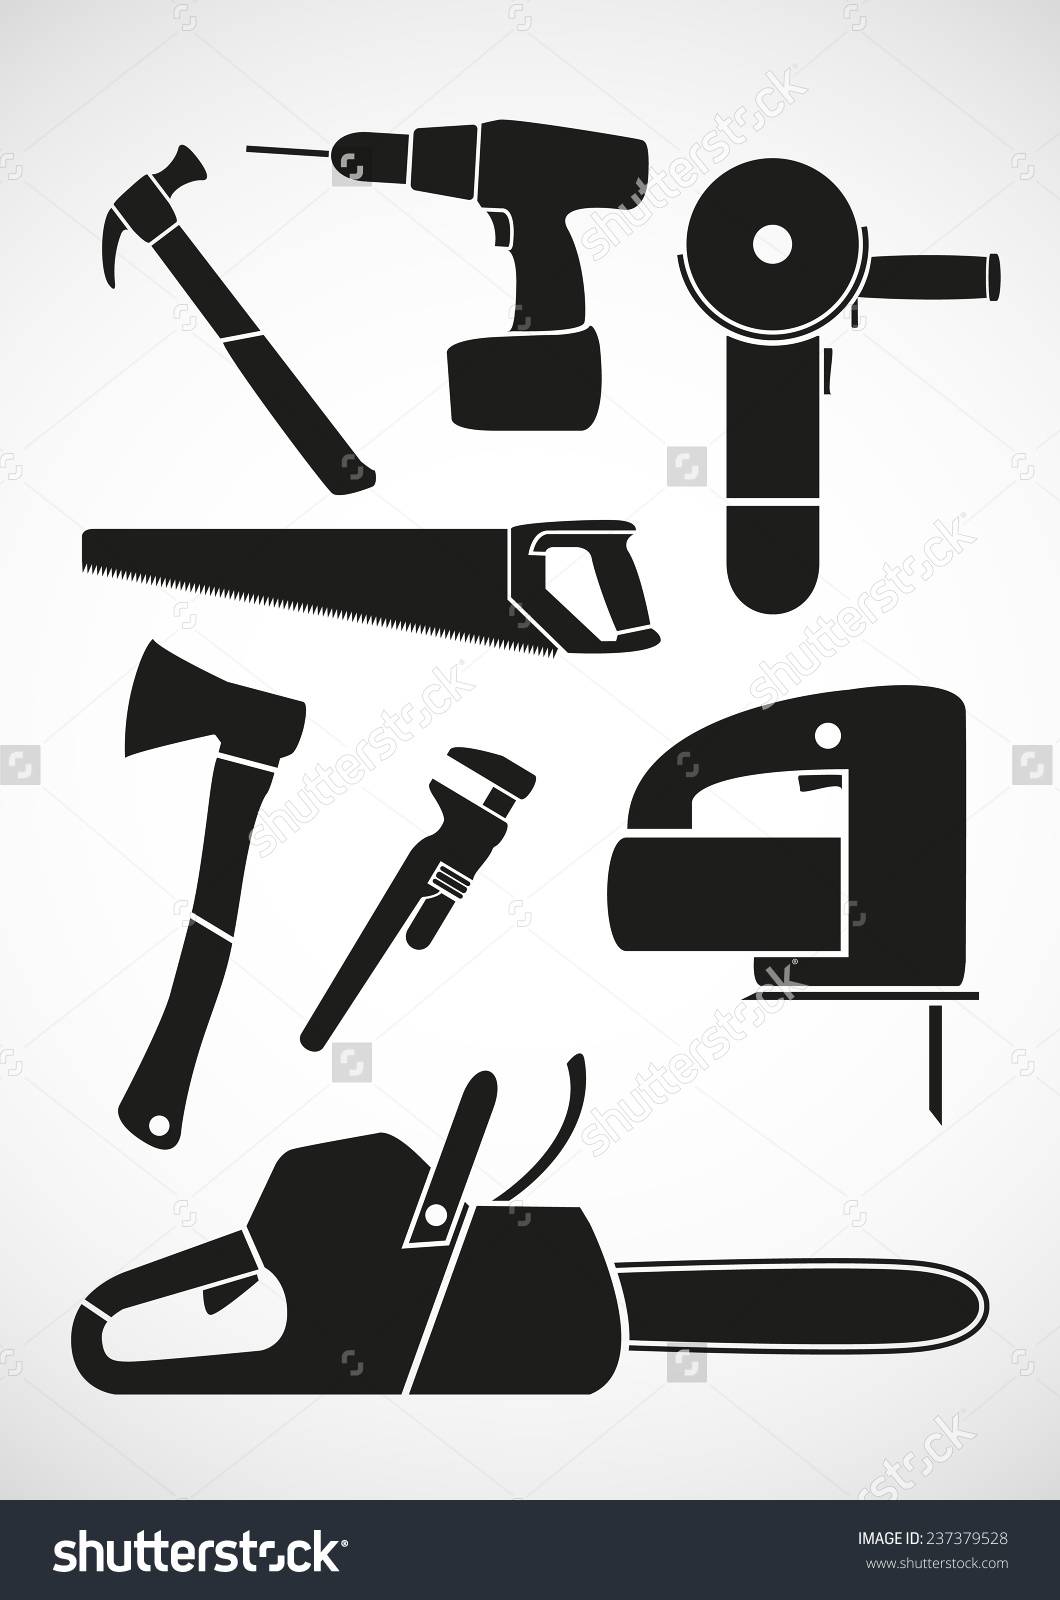 Angle Grinder Blade Stock Vectors & Vector Clip Art.